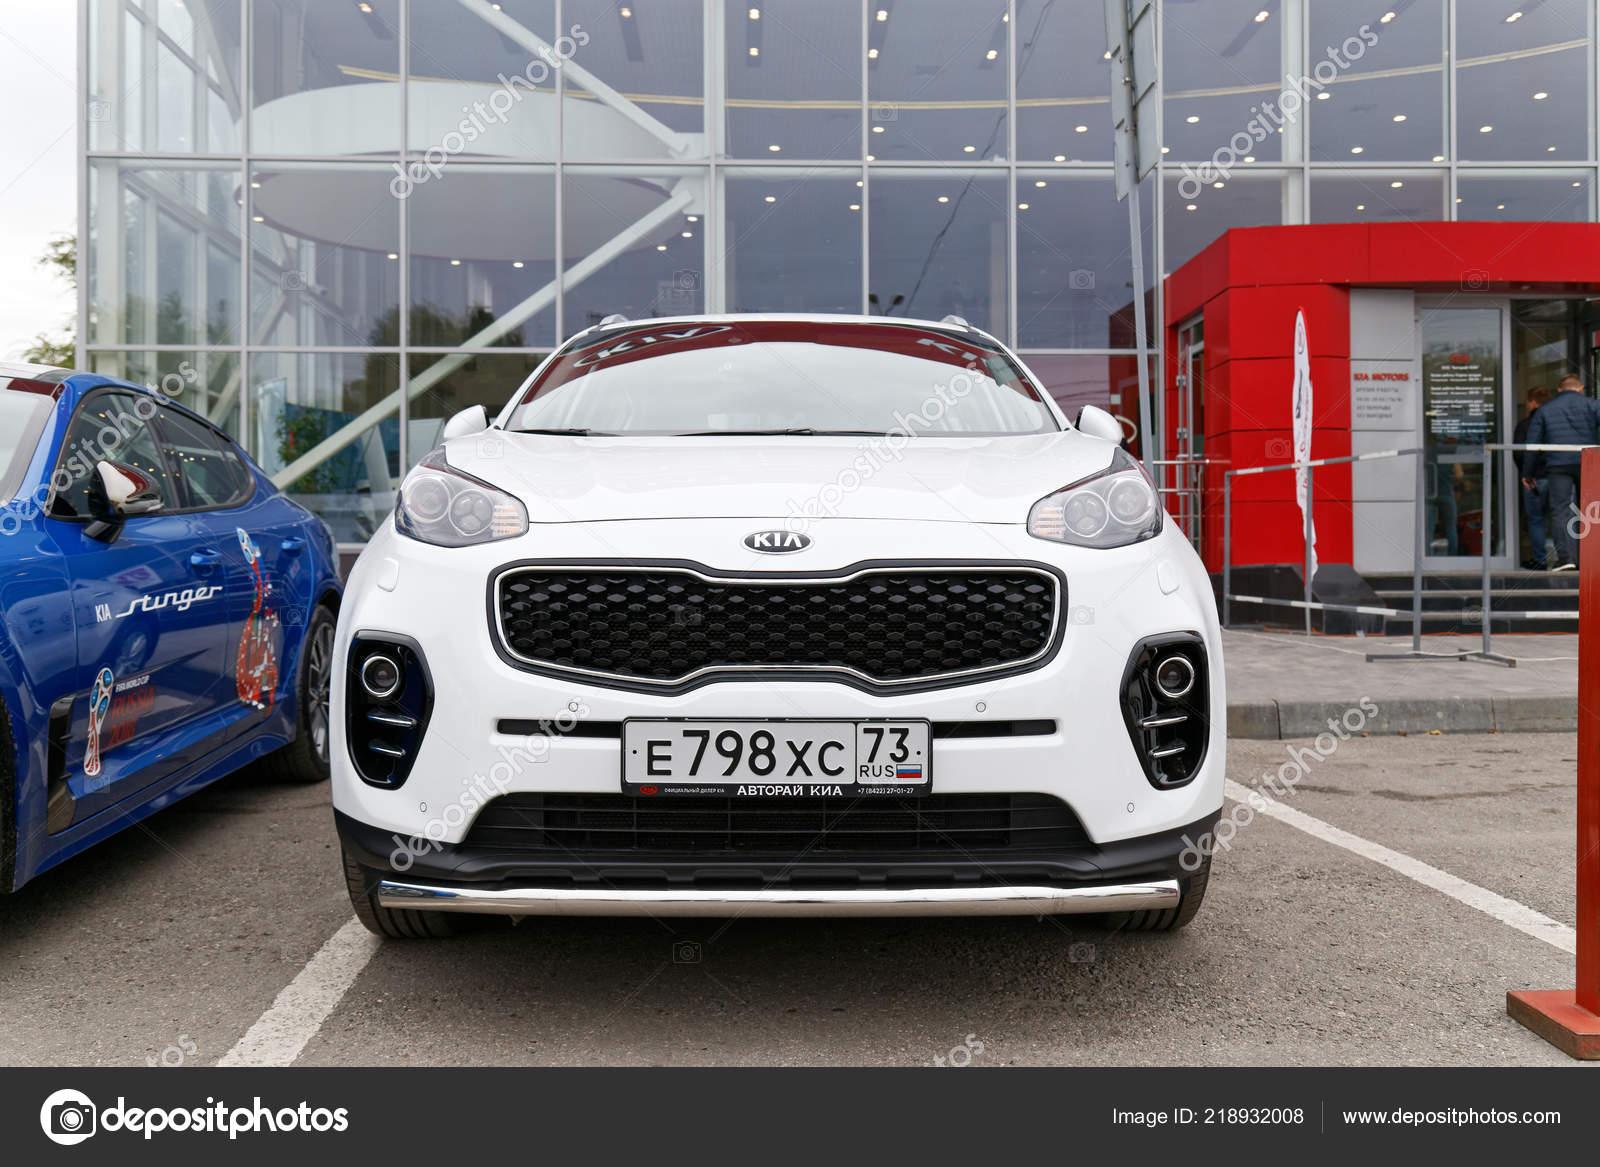 Ulyanovsk Russia October 2018 New Kia Sportage Exhibition Car Stands Stock Editorial Photo C Mark Ka 218932008